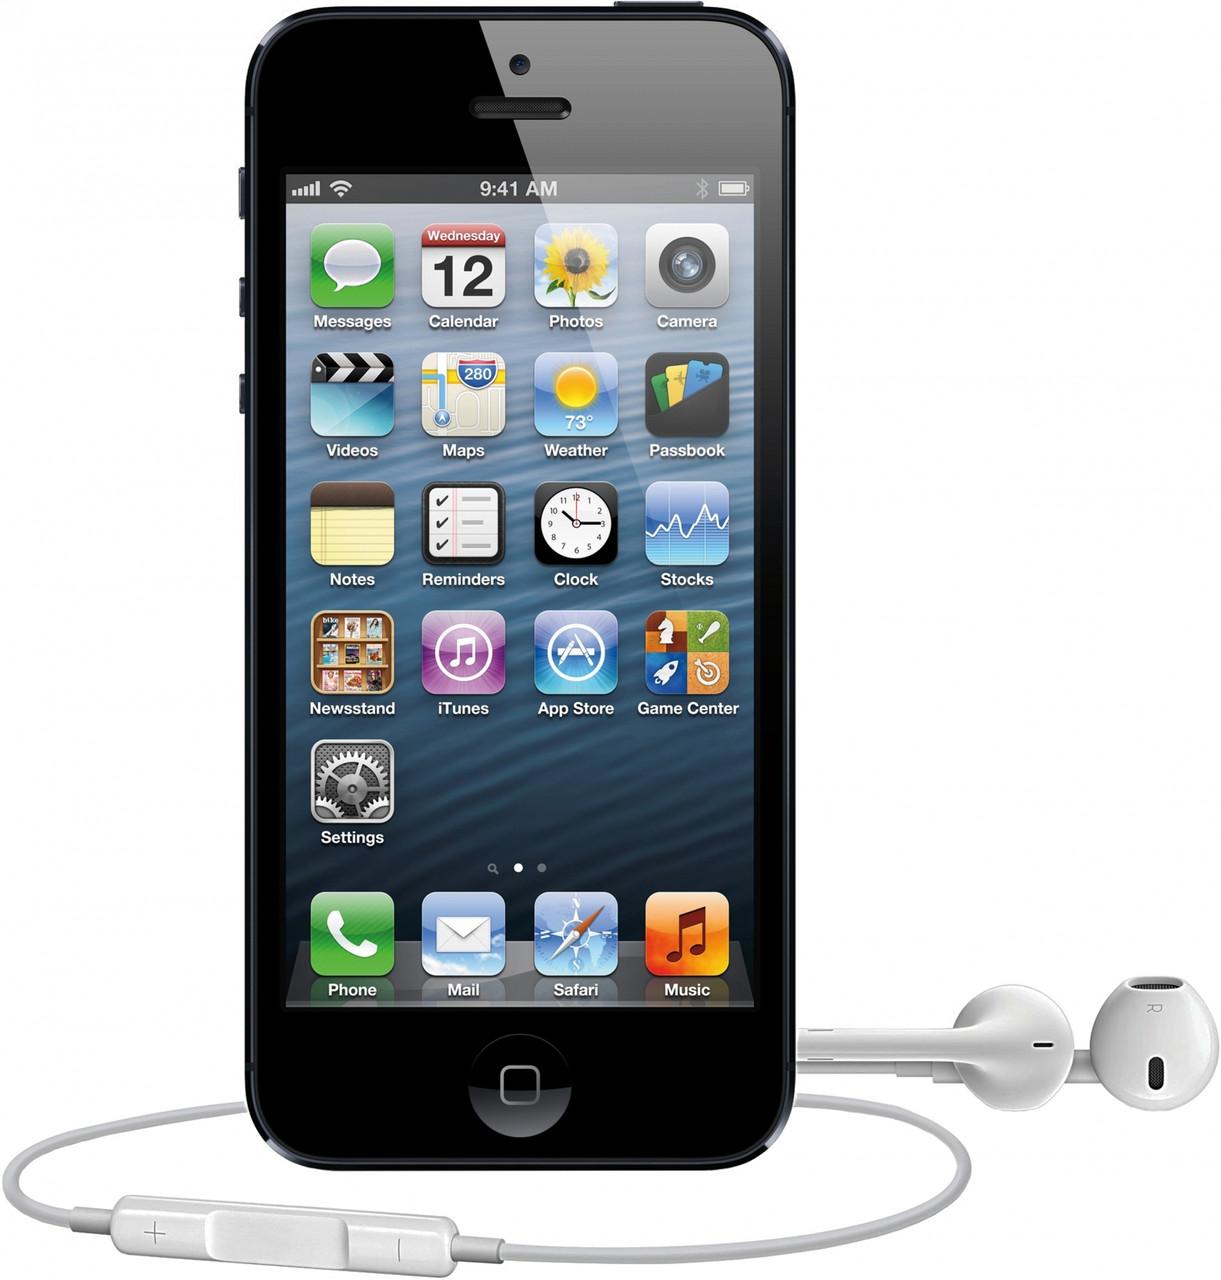 Apple iPhone 5 16GB (Black) Refurbished